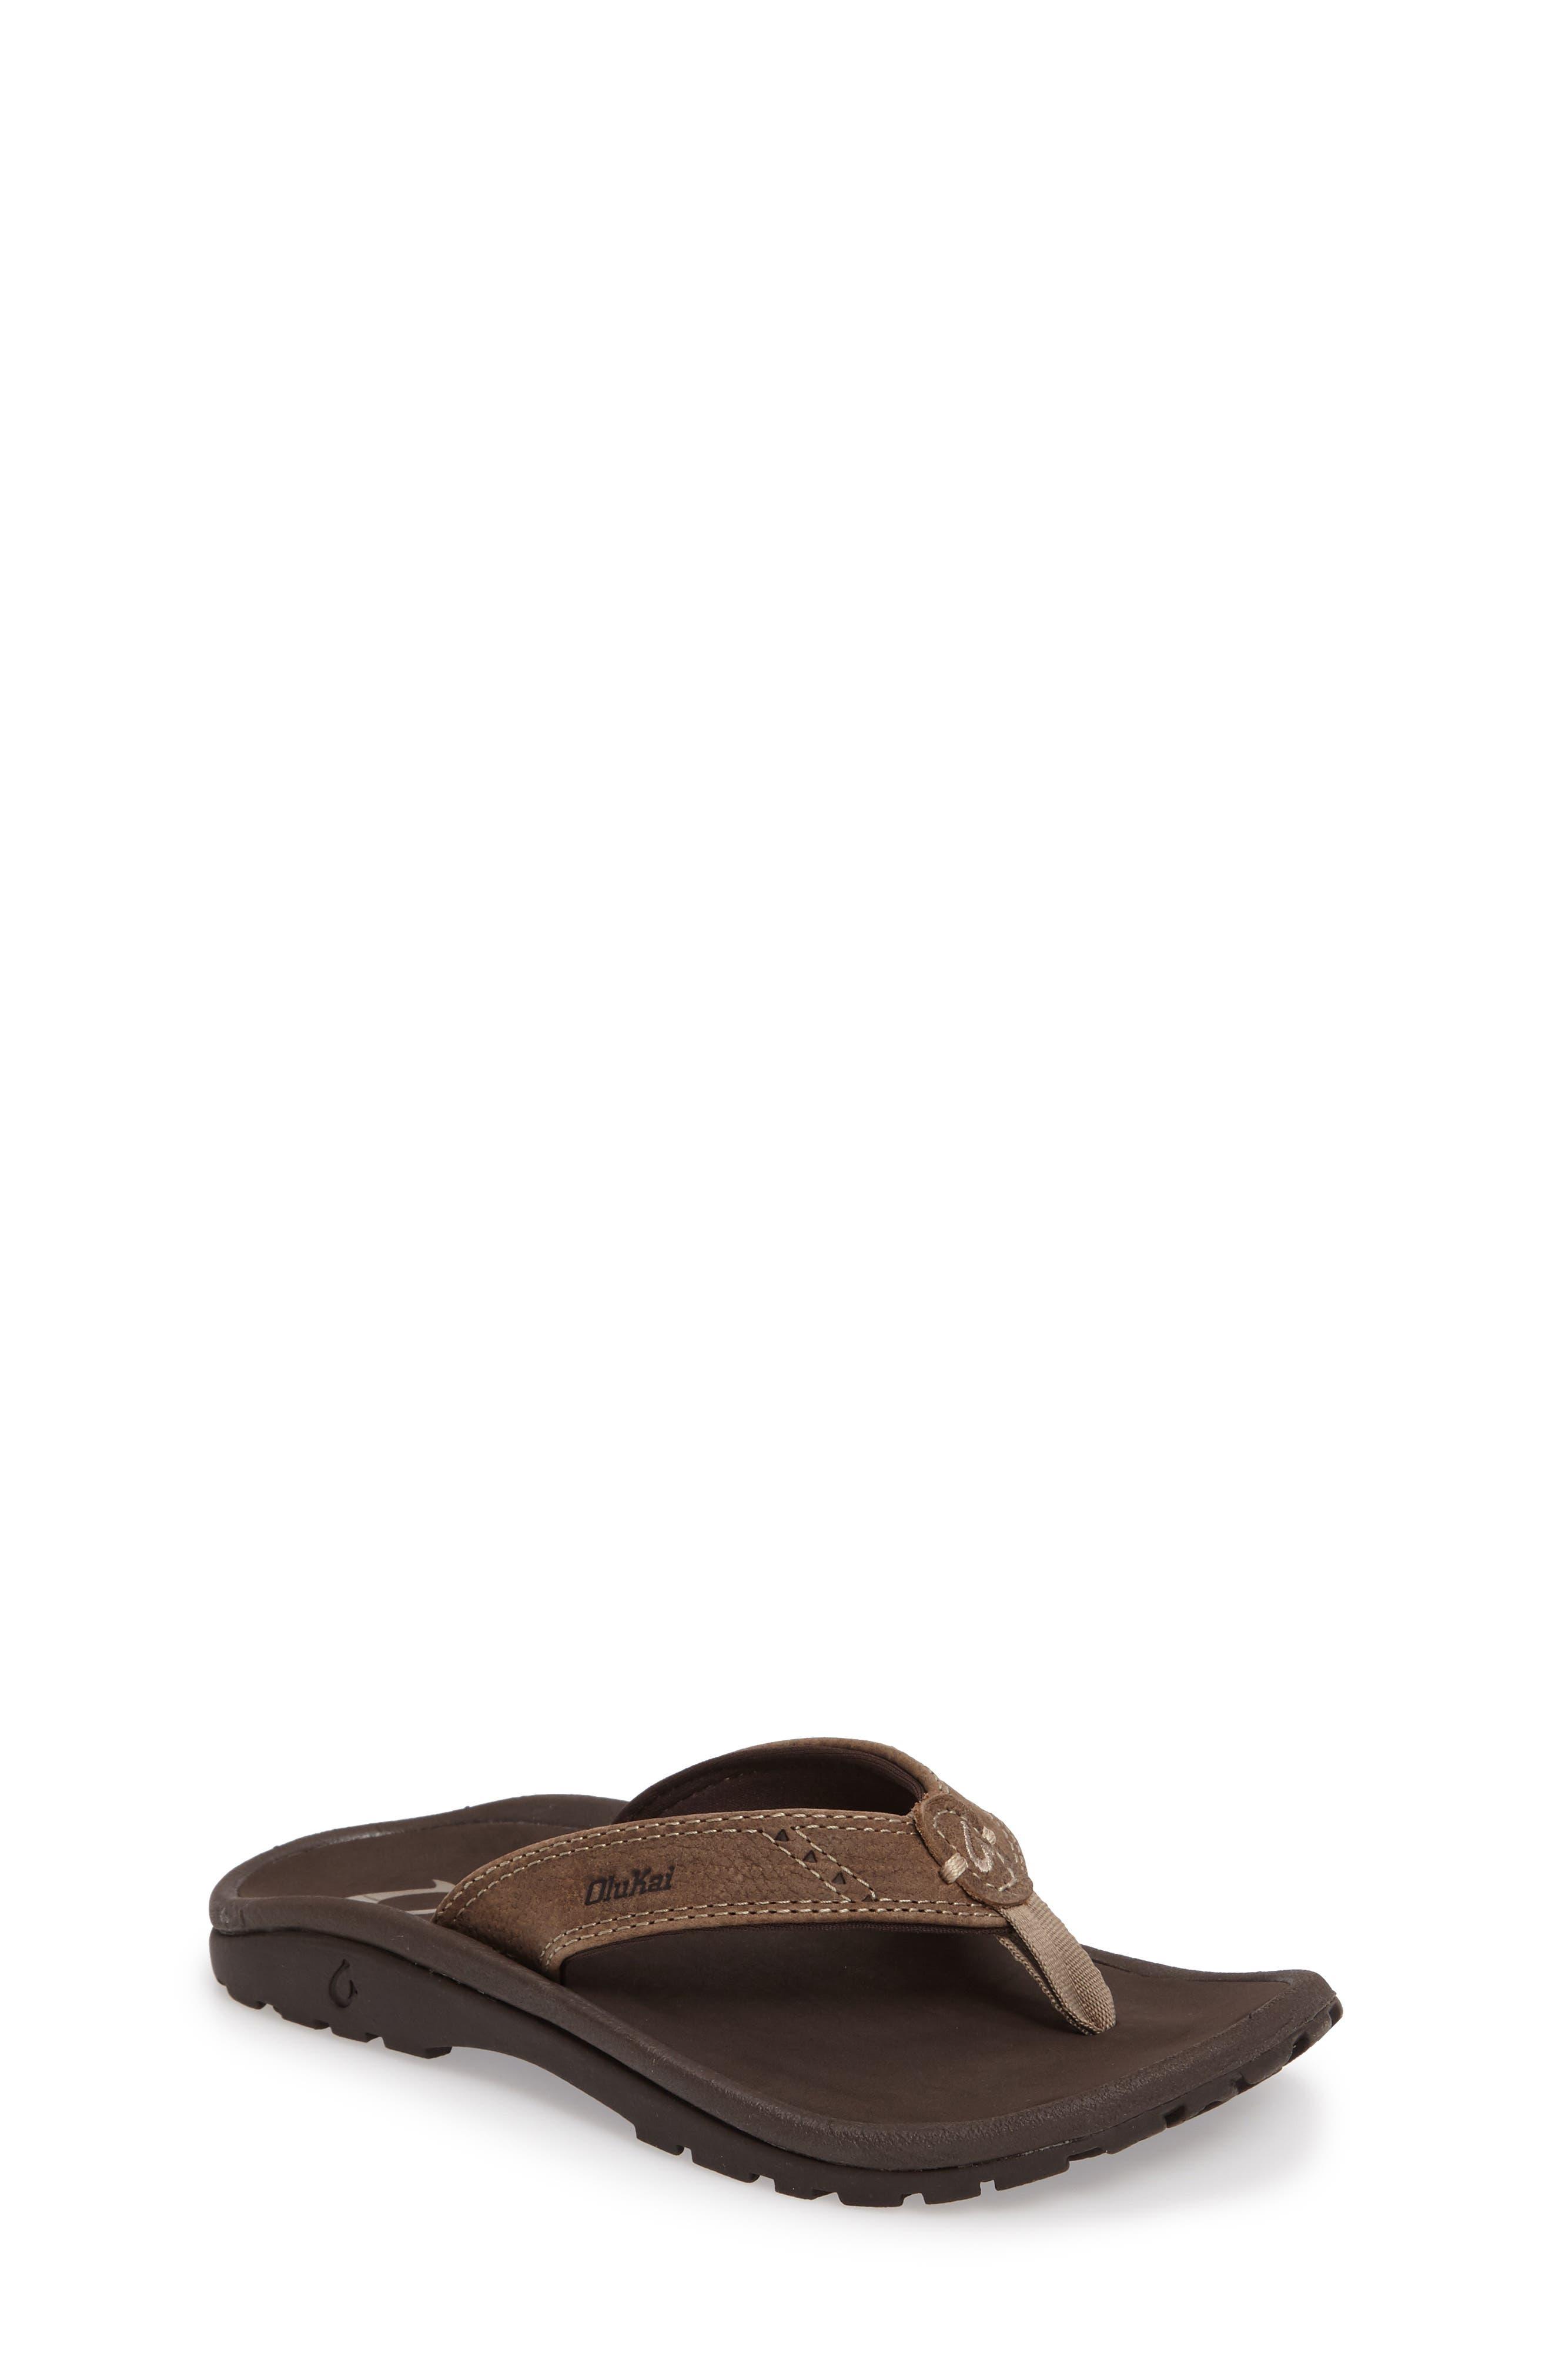 Nui Leather Flip Flop,                         Main,                         color, CLAY/ DARK JAVA